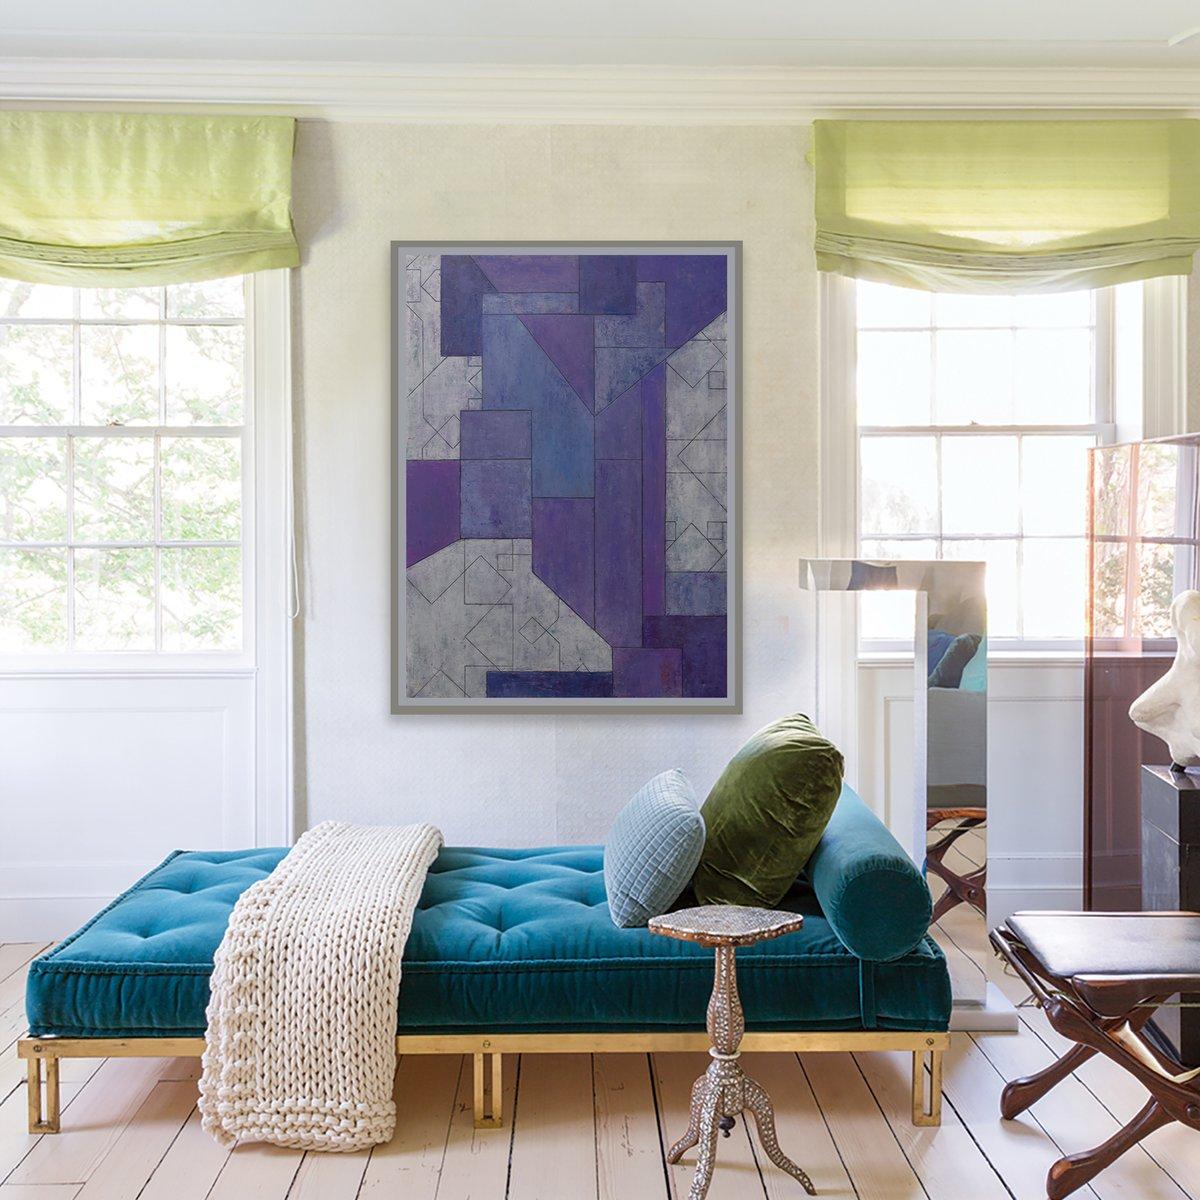 purple haze  http://bit.ly/1QwcJpP   #abstract  #interior design #geometric #fine art  #midcenturymodernpic.twitter.com/f0iy6Ly2tR